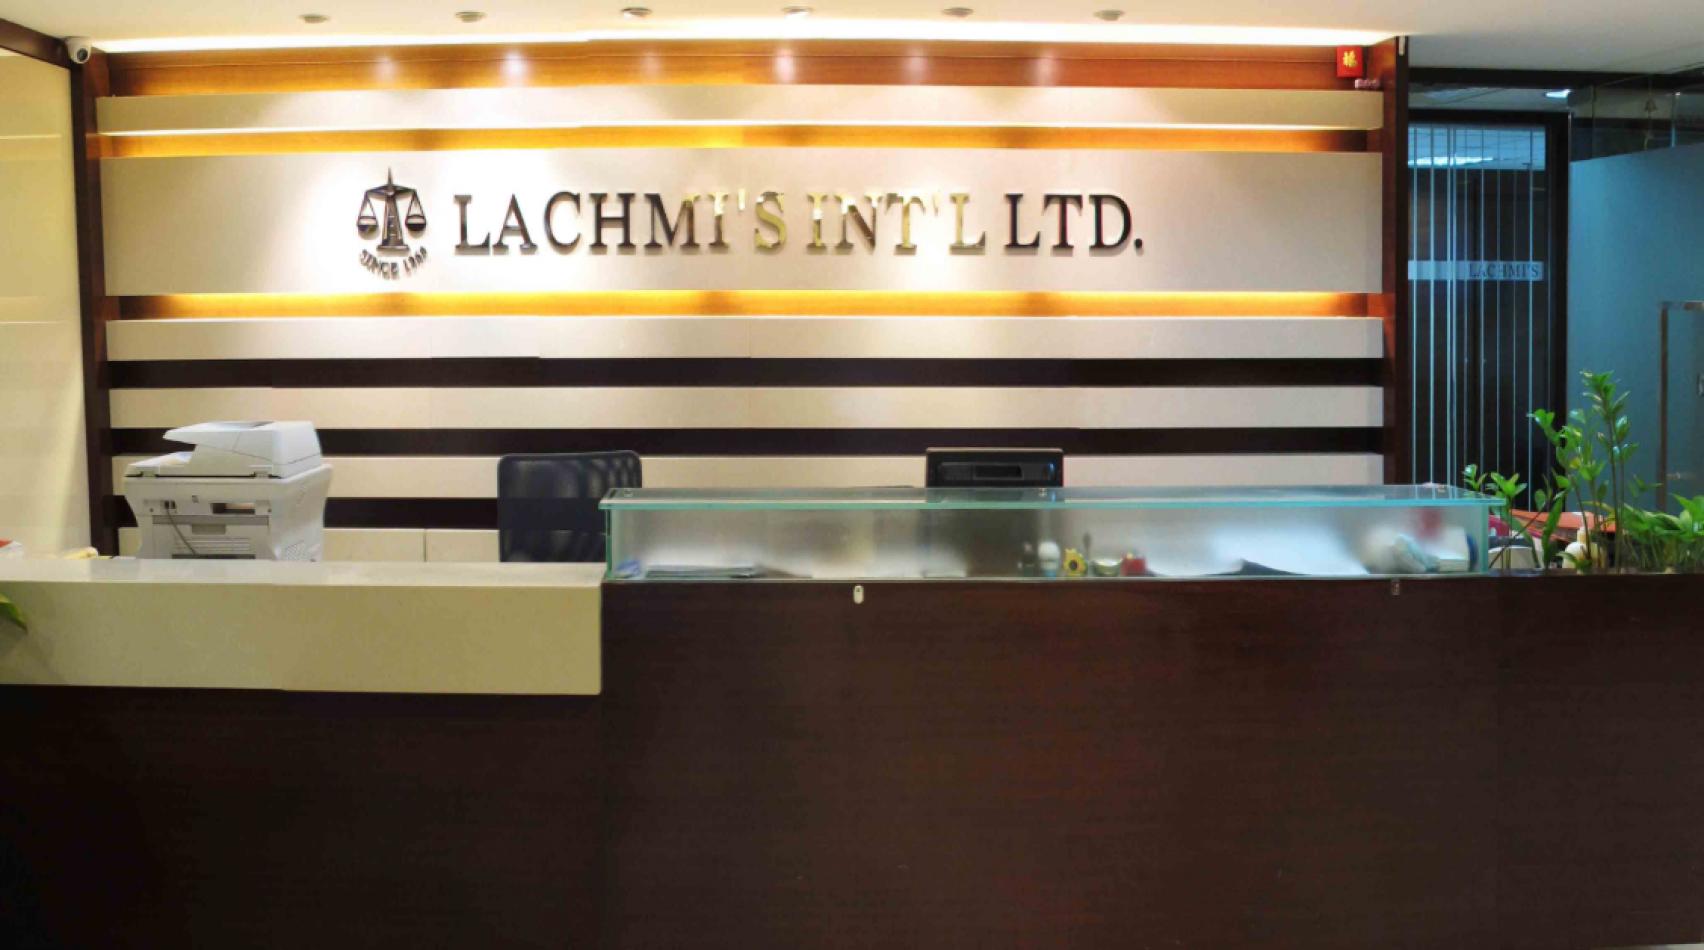 LACHMIS INTERNATIONAL LTD